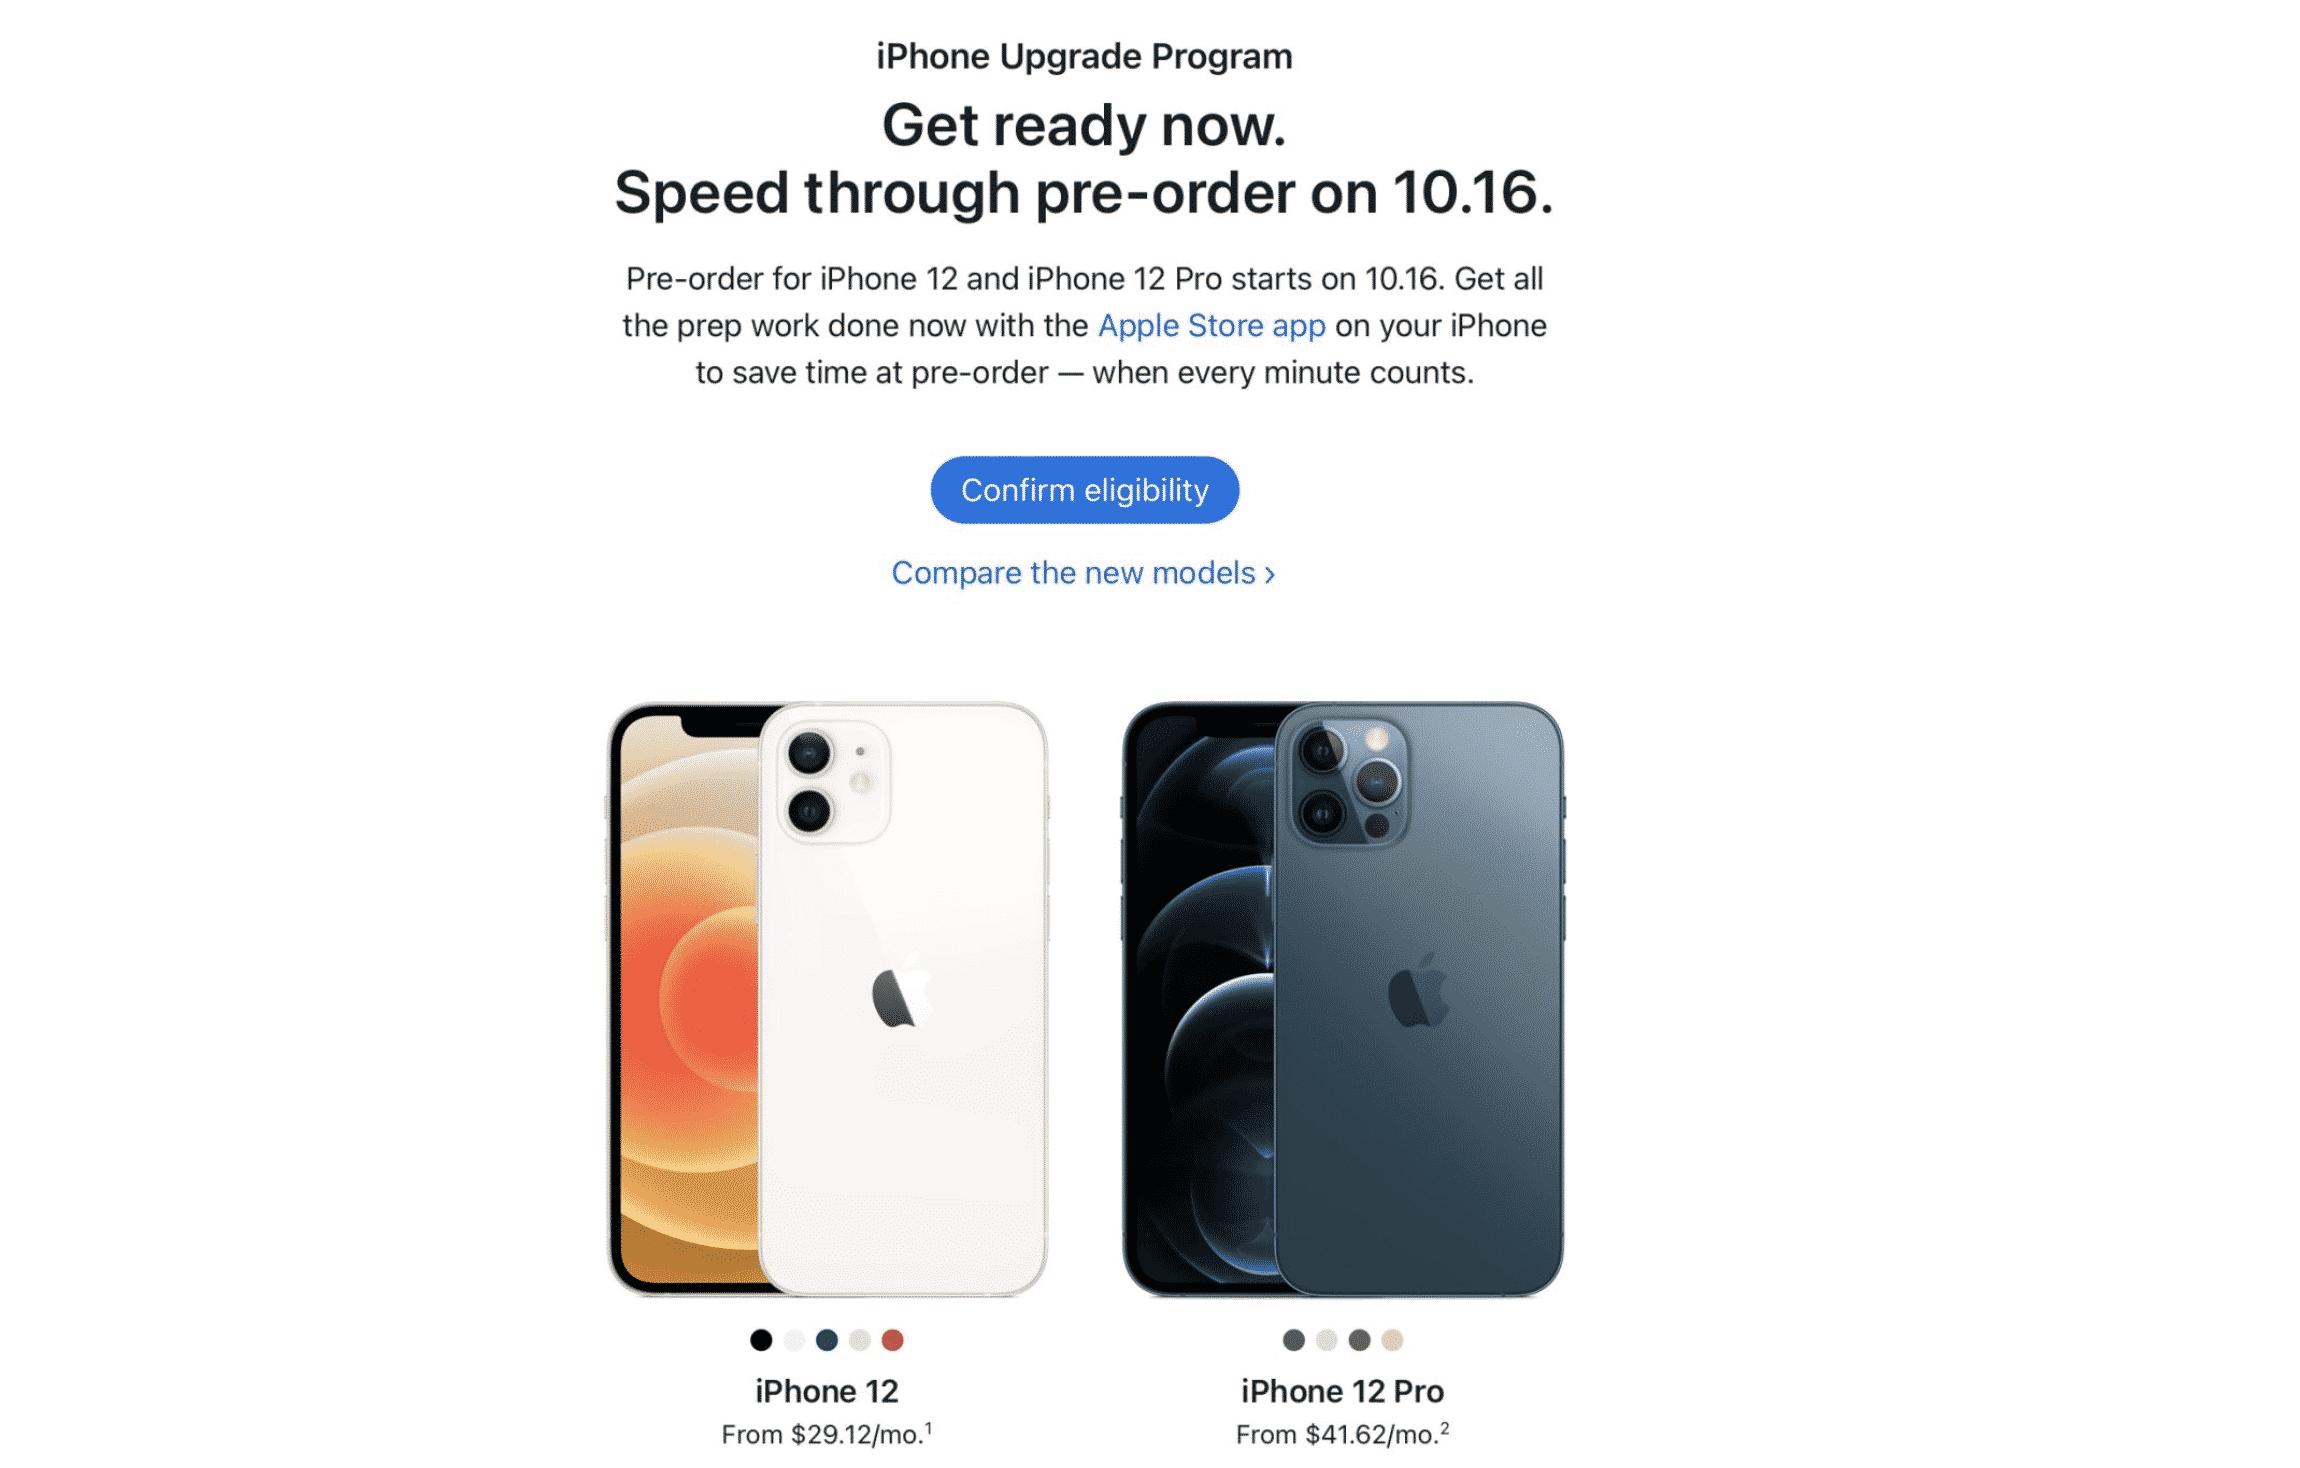 iPhone 13 via iPhone Upgrade Program